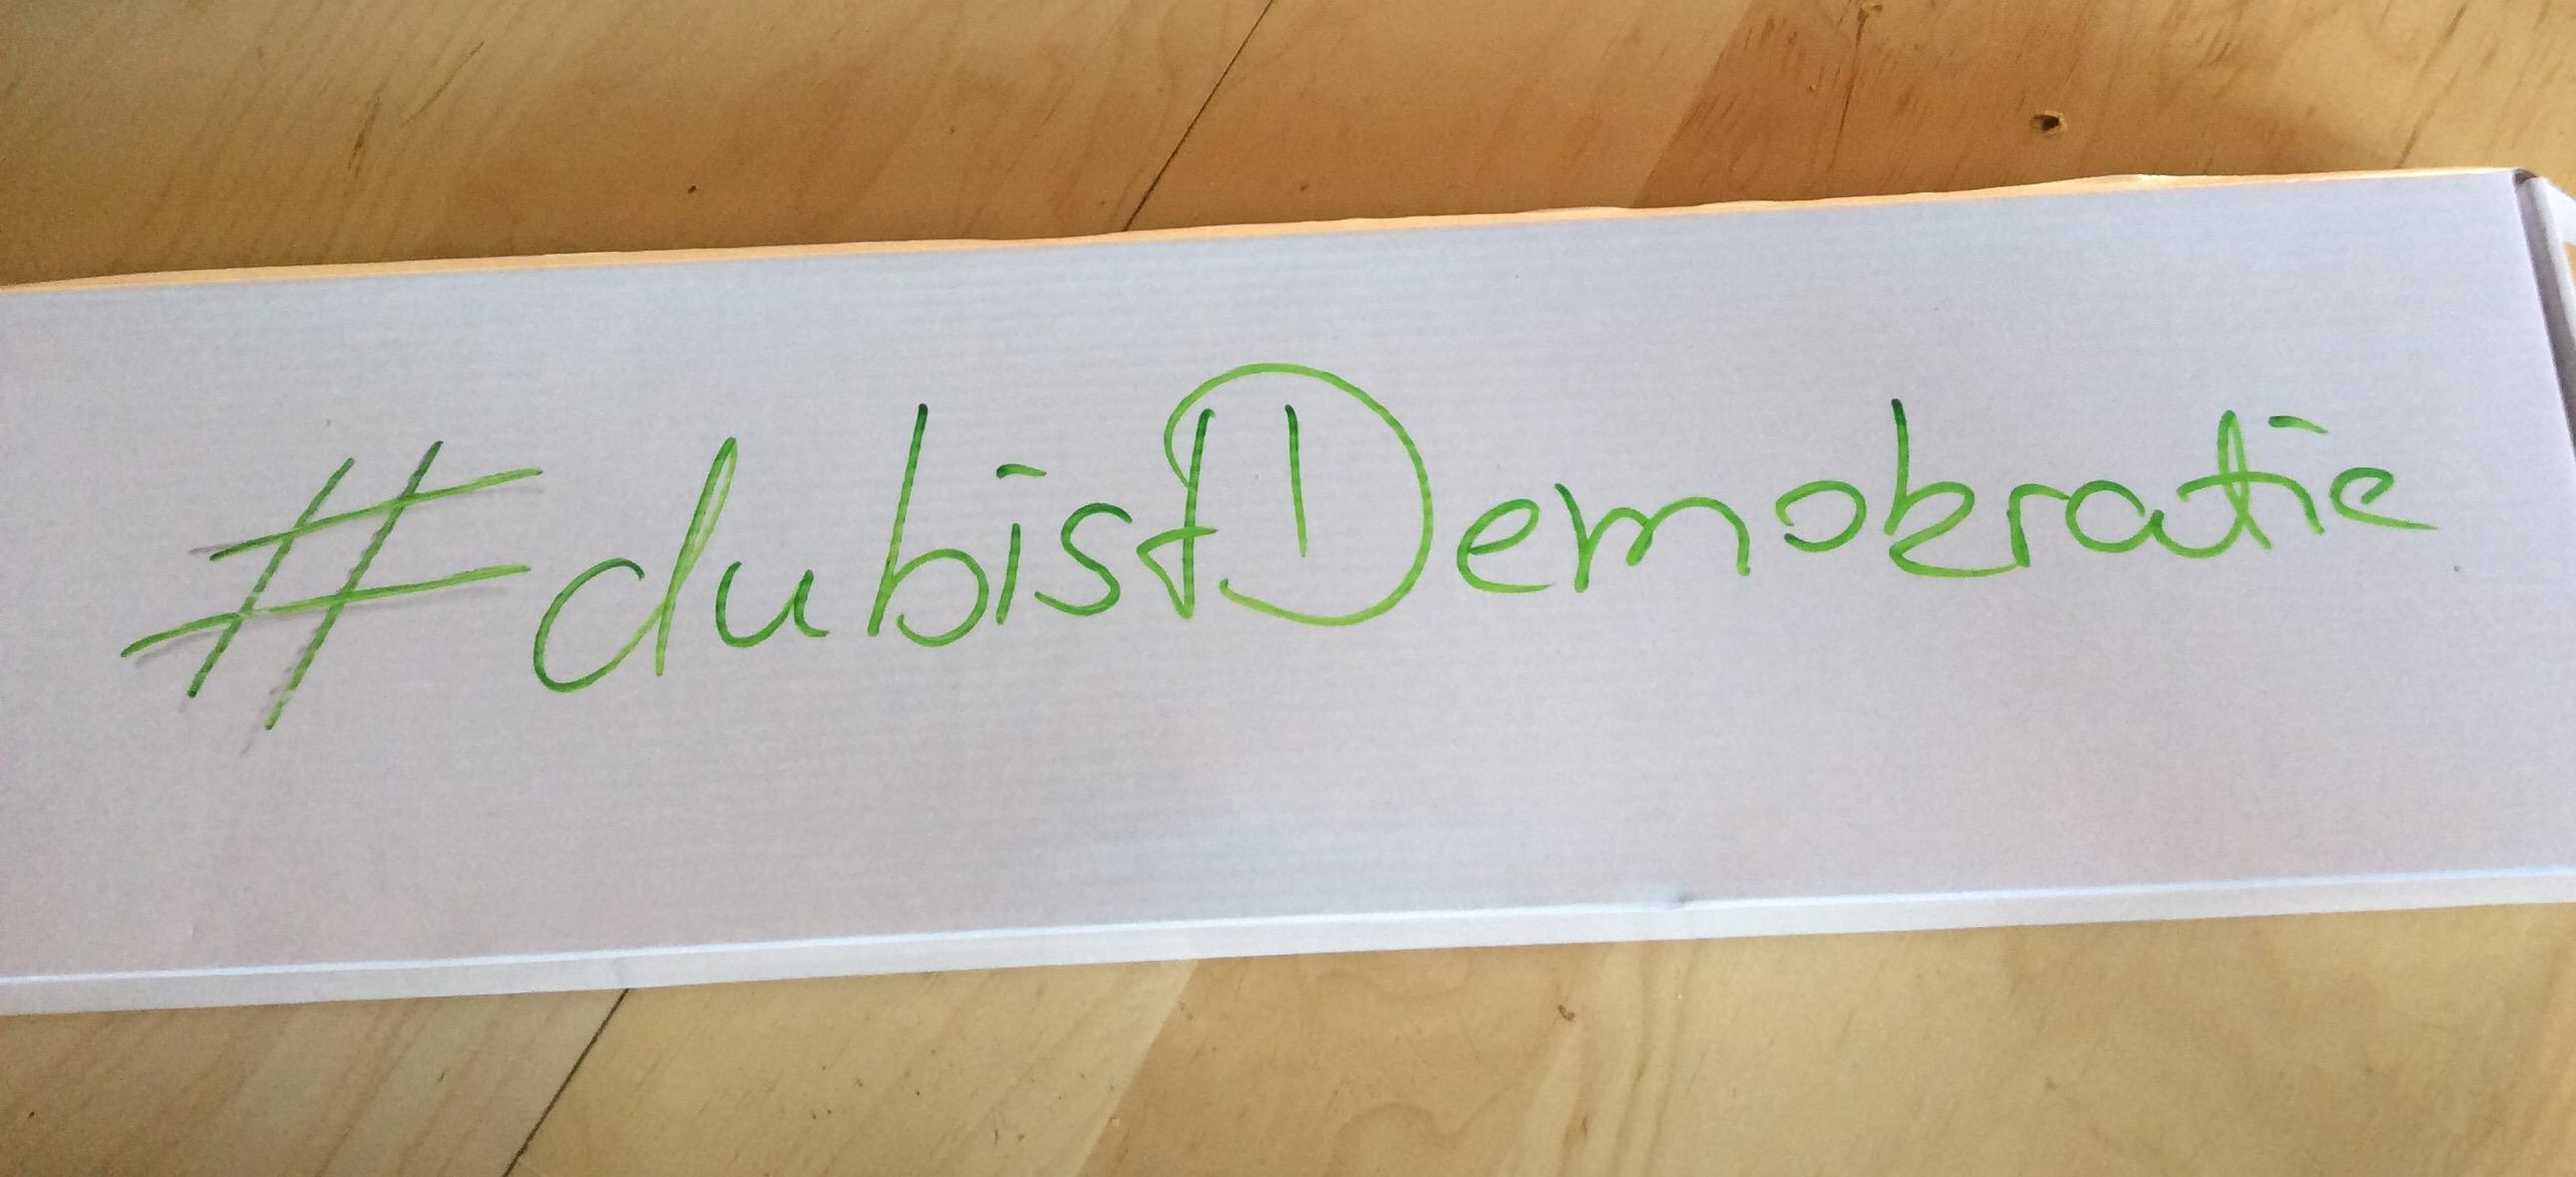 #dubistdemokratie